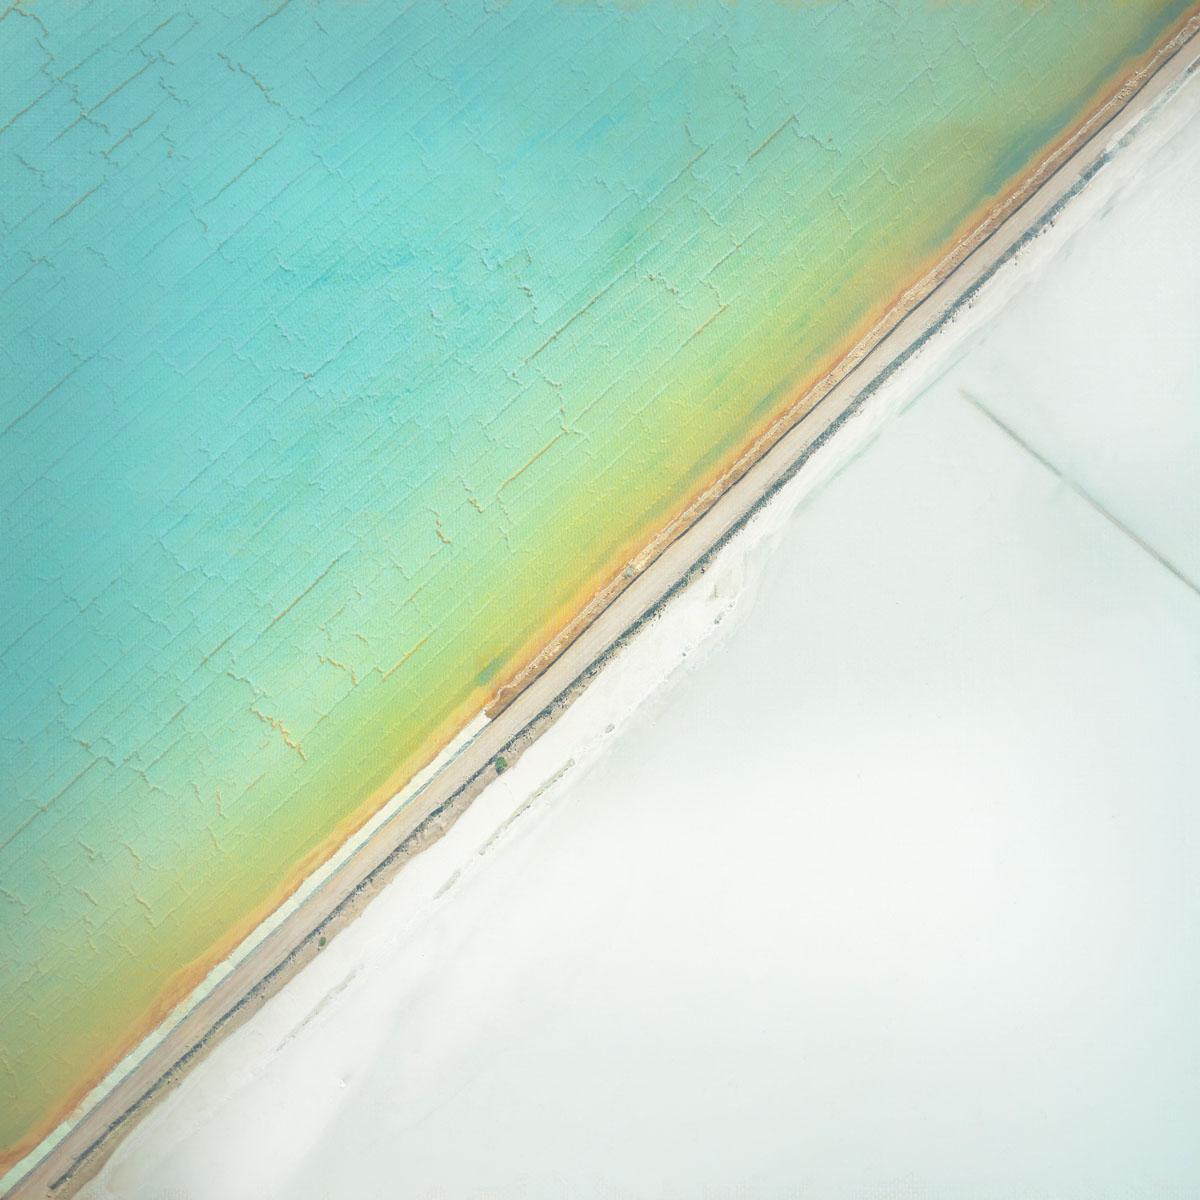 Chris Saunders - 'Aerial Salt 031'